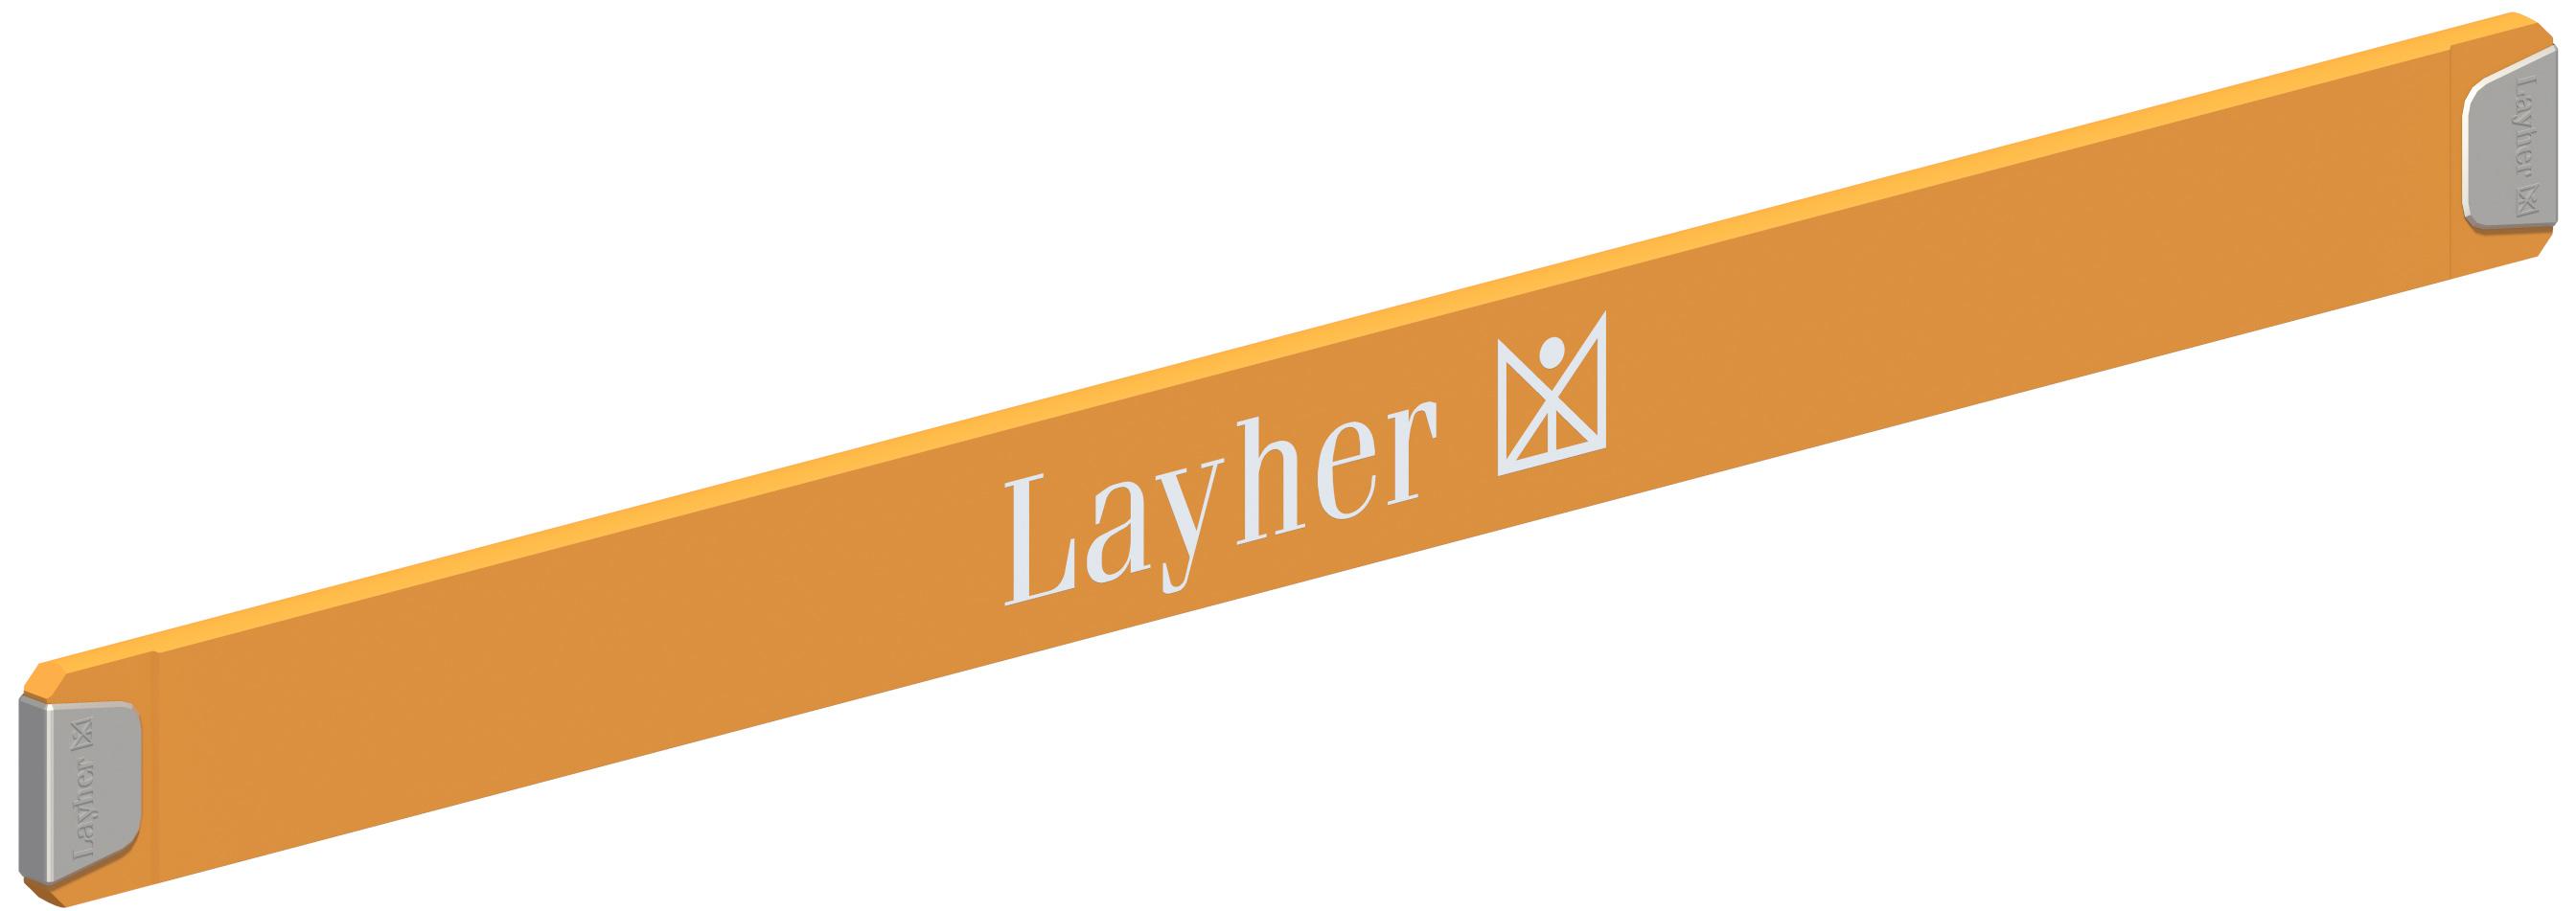 Layher Staro Rollbock Holz-Stirnbordbrett 1,90 m